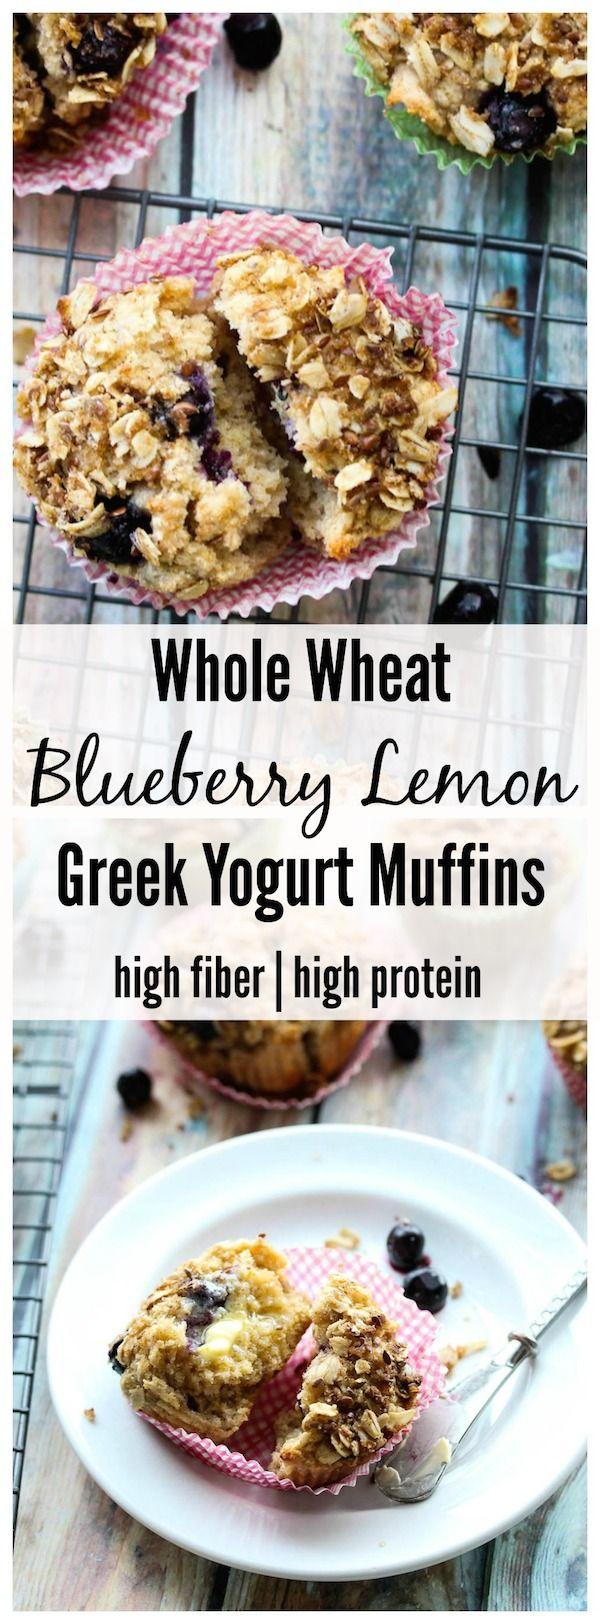 Whole Wheat Blueberry Lemon Greek Yogurt Muffins (high protein, high fiber) | dishingouthealth.com